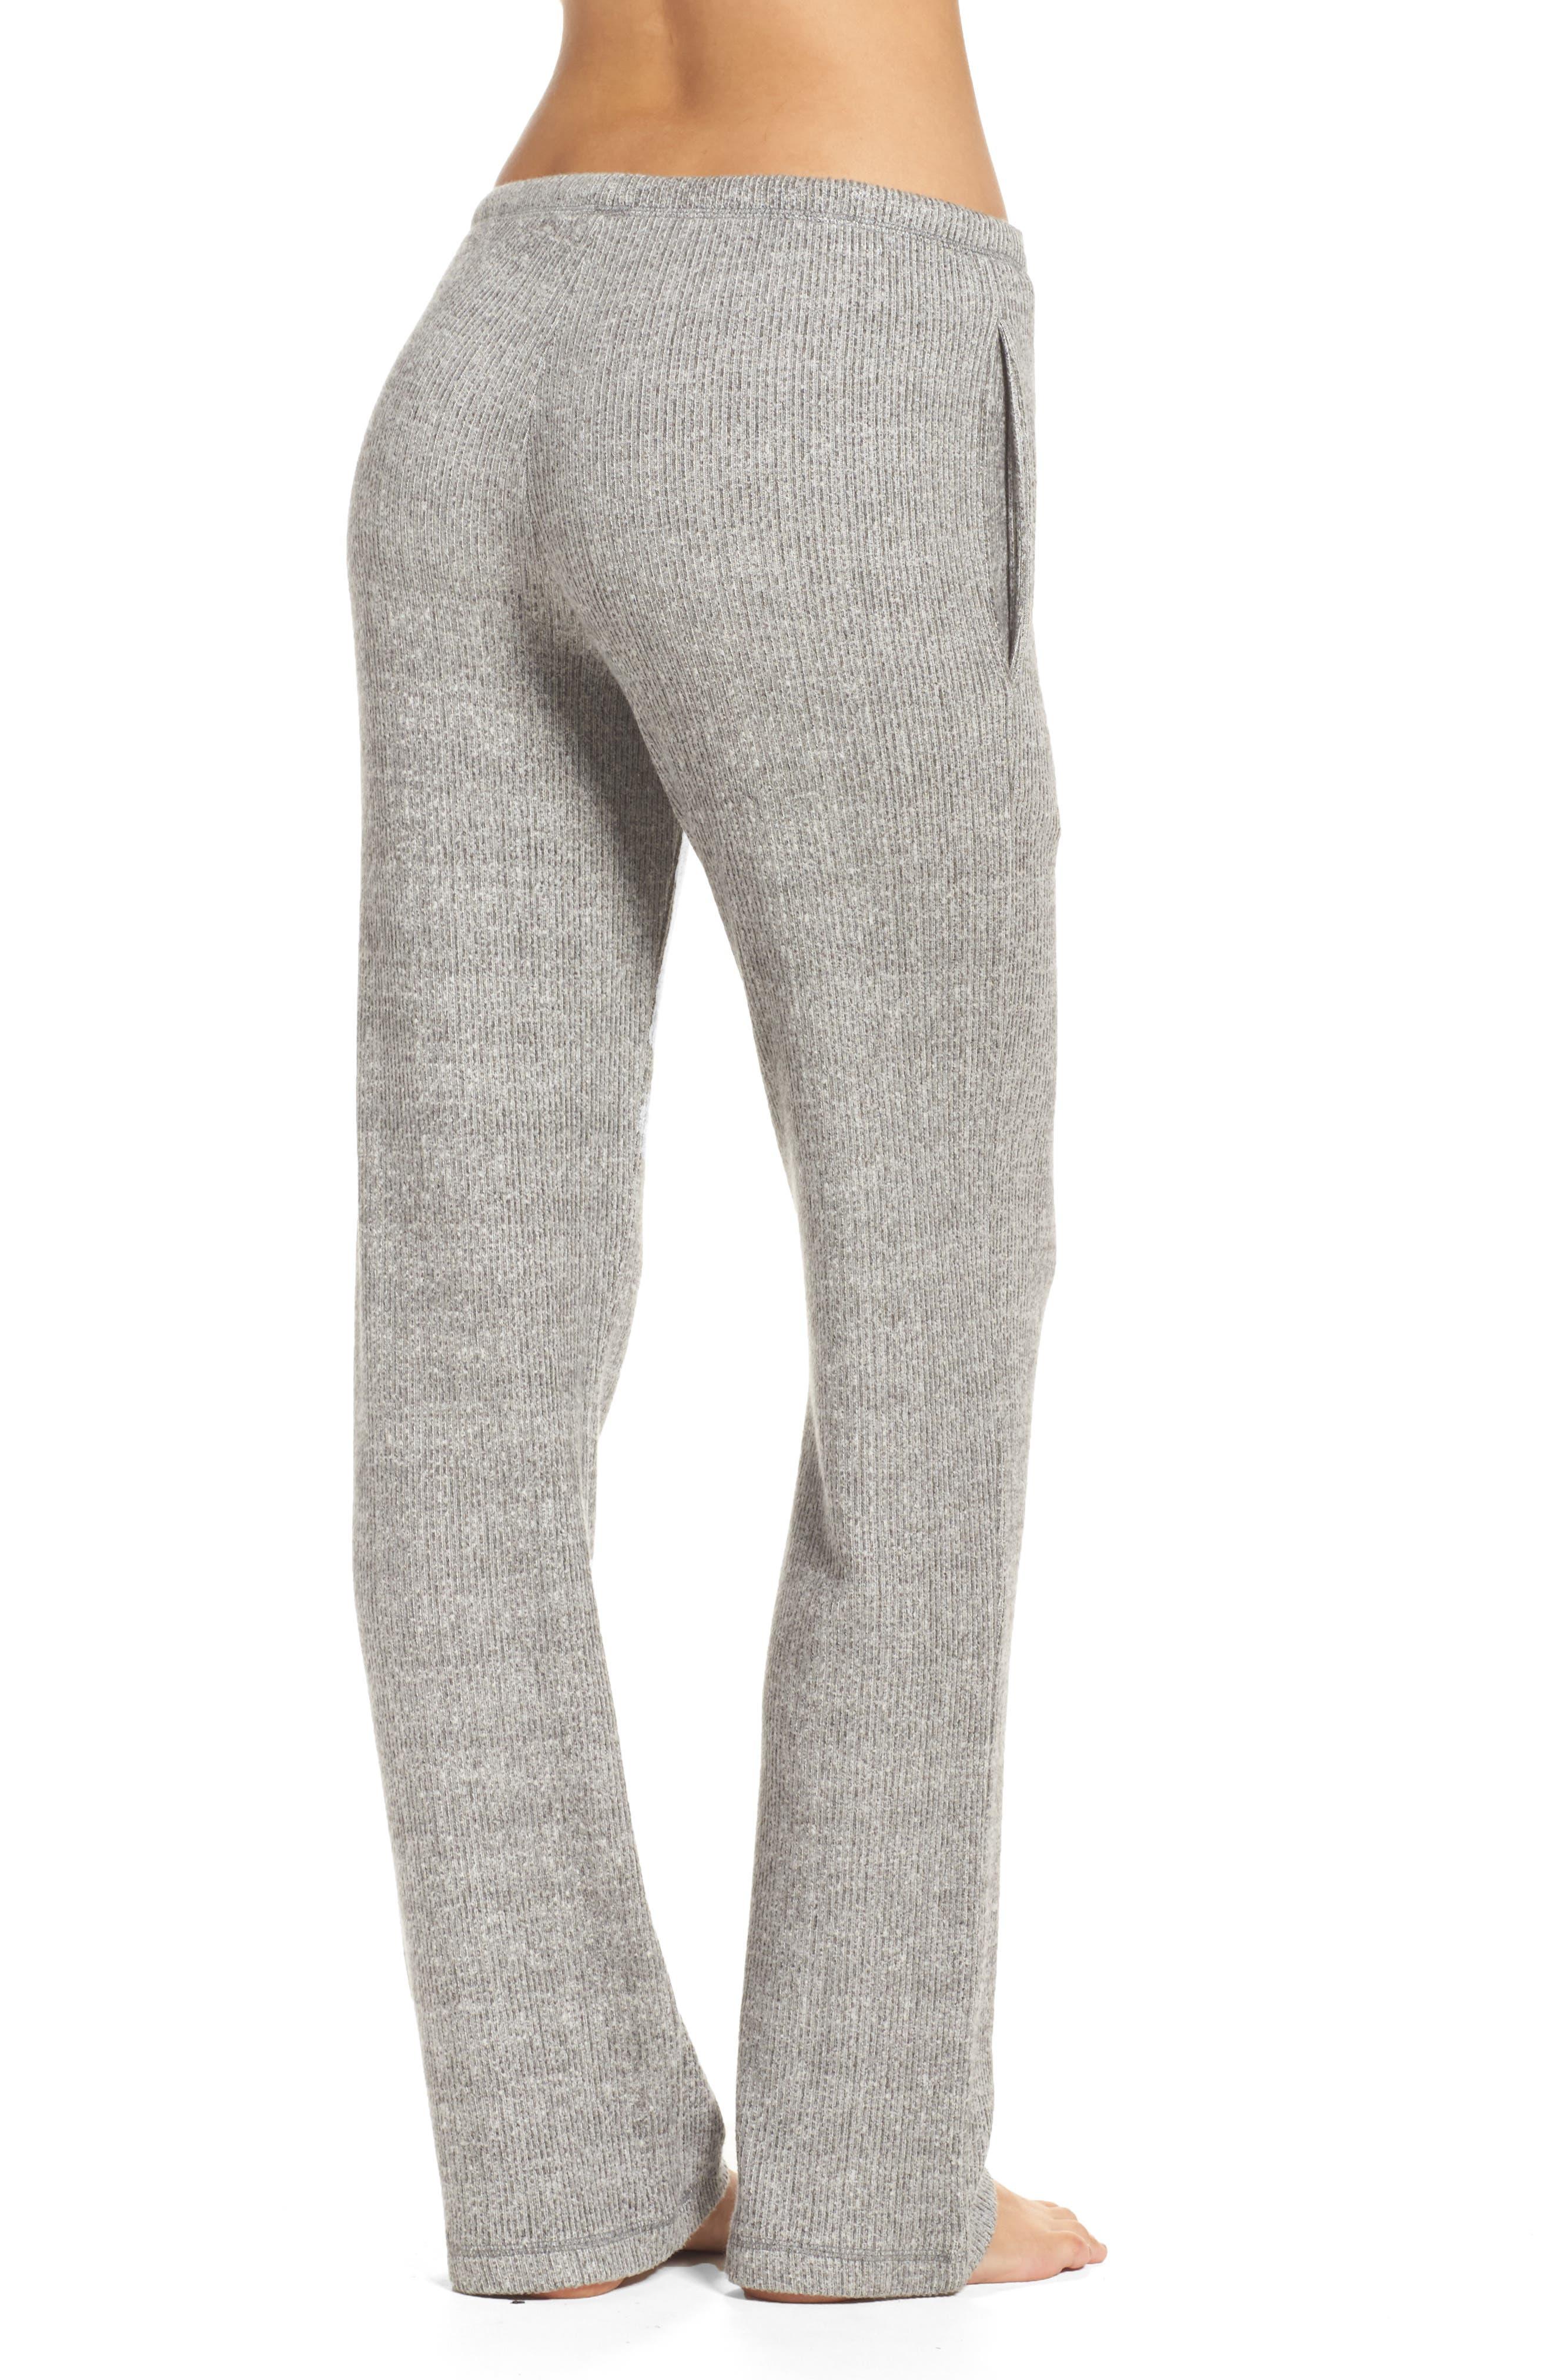 Knit Lounge Pants,                             Alternate thumbnail 2, color,                             020